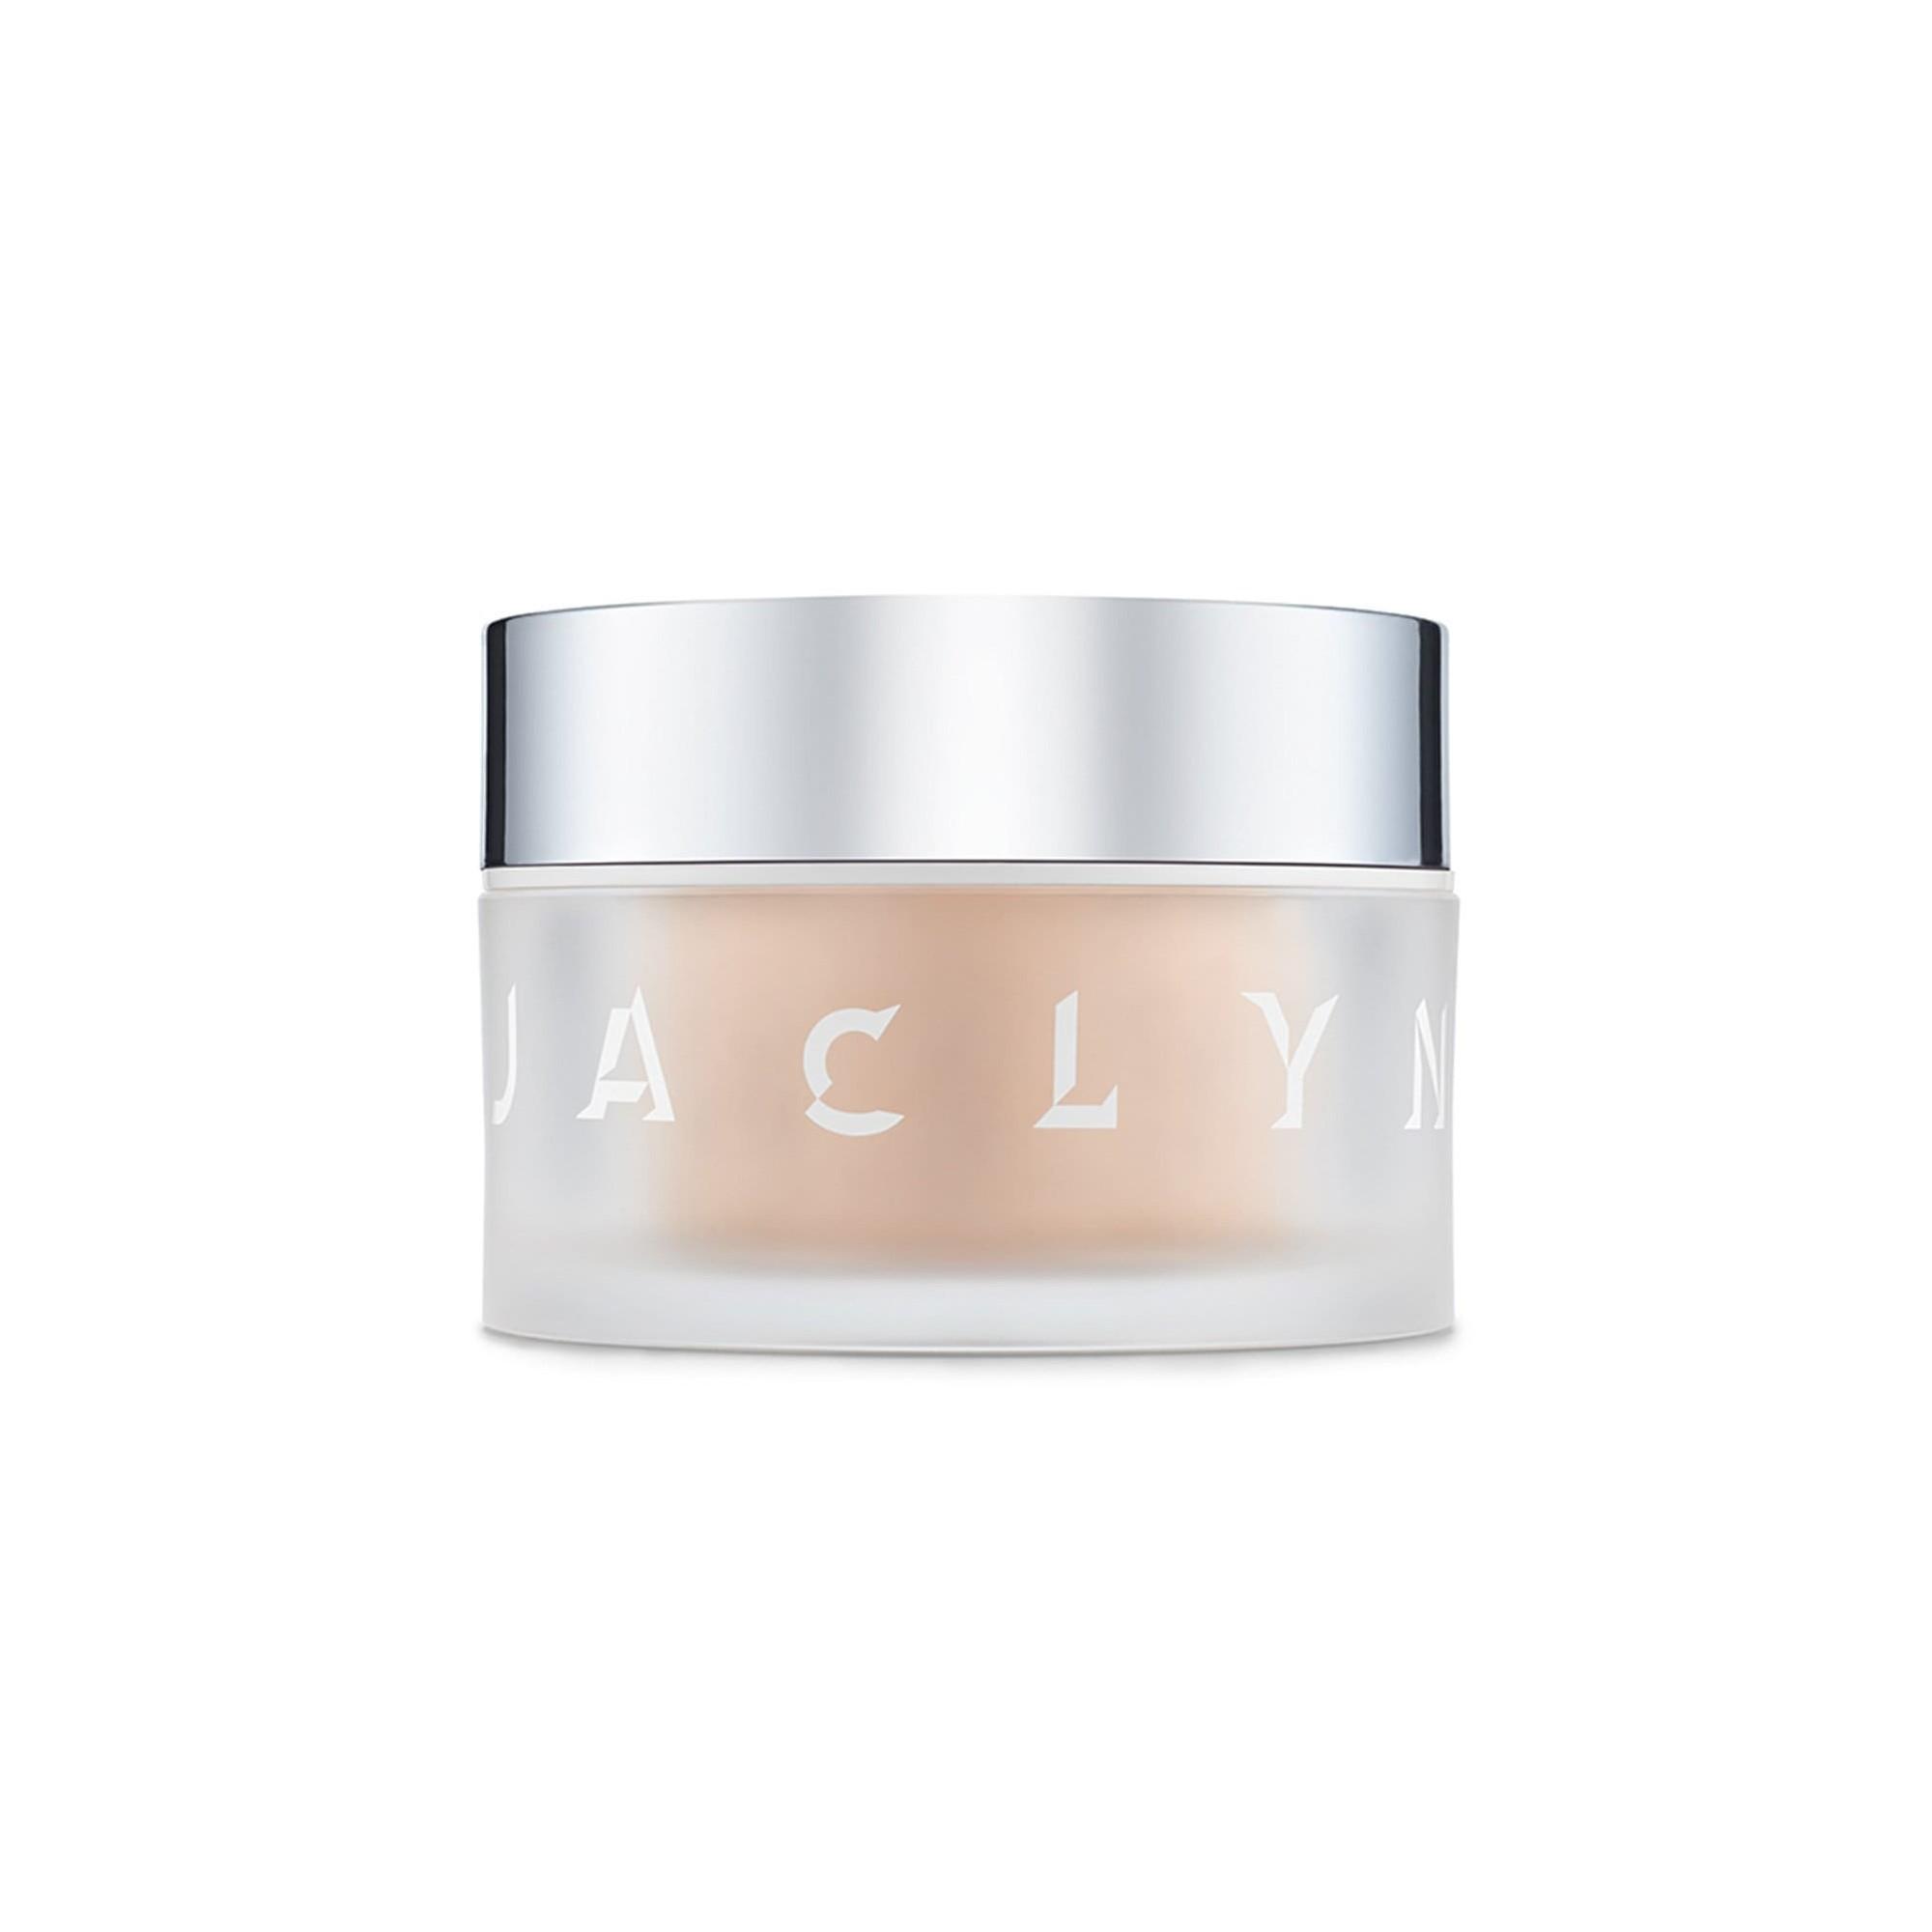 Jaclyn Cosmetics Mood Light Luminous Powder Brighten Up